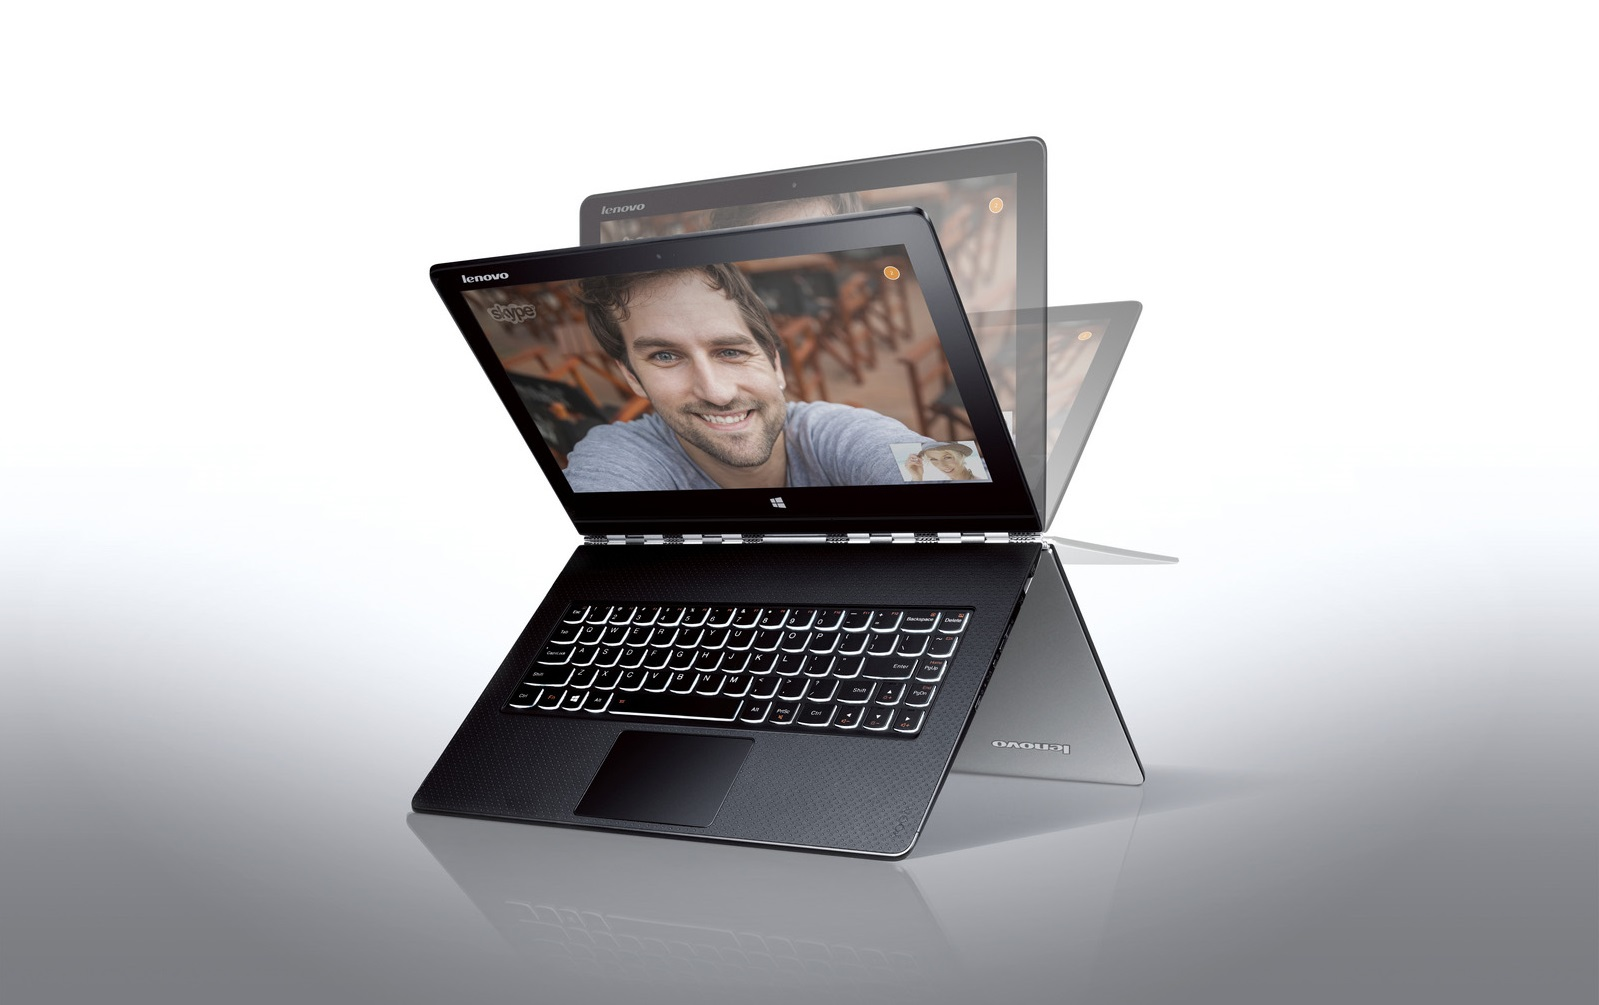 Core m lenovo lenovo yoga 3 pro notebook windows yoga 3 yoga 3 pro